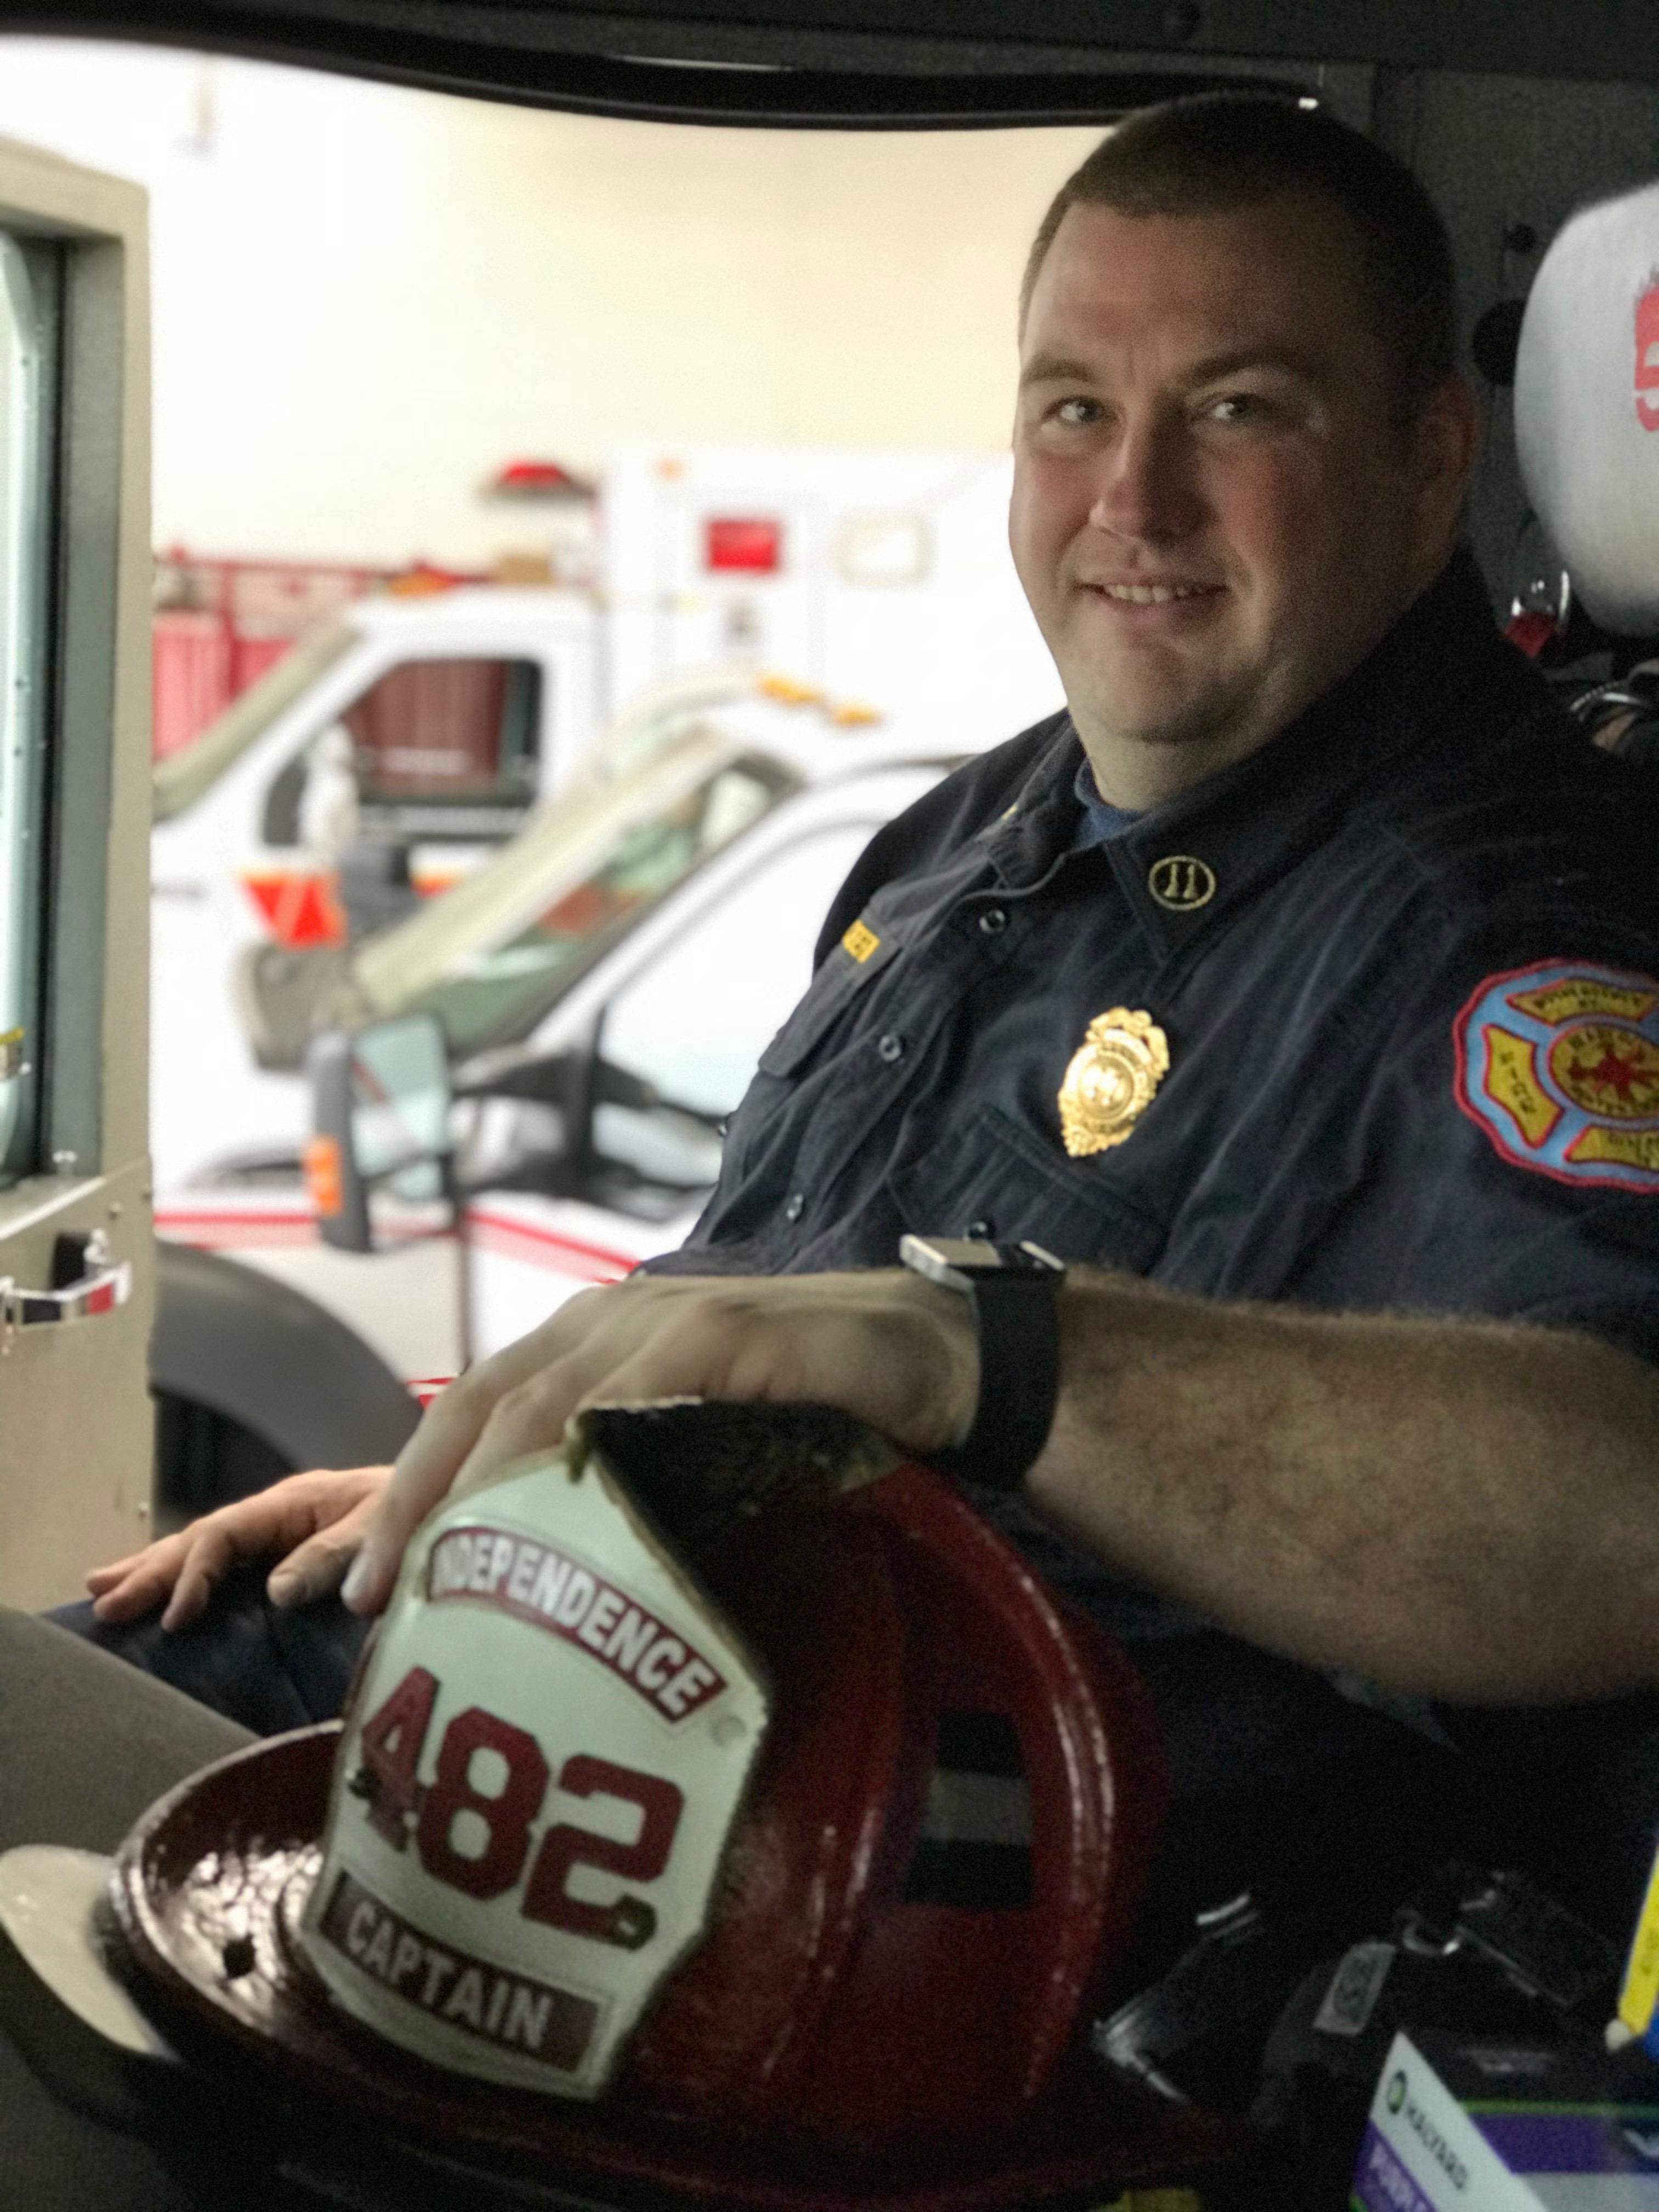 Captain EMT Brian Claybern